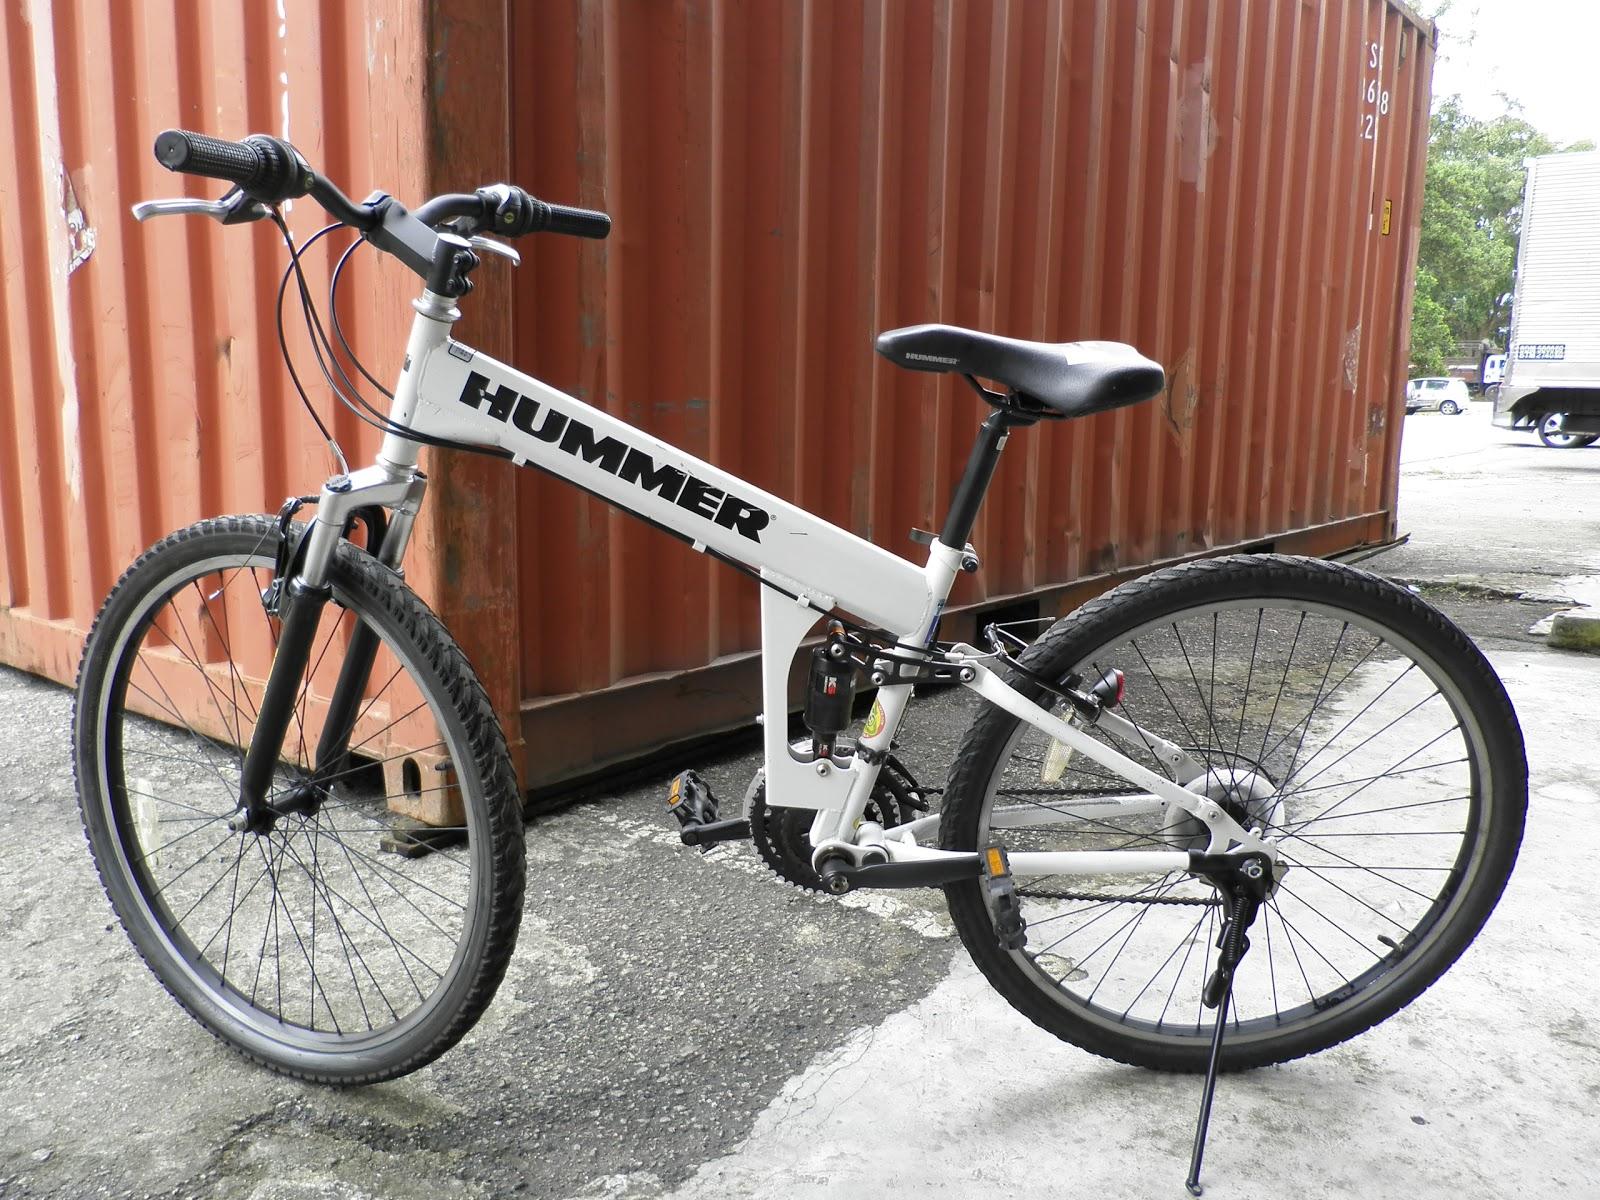 hummer mountain bike import from japan selling price. Black Bedroom Furniture Sets. Home Design Ideas